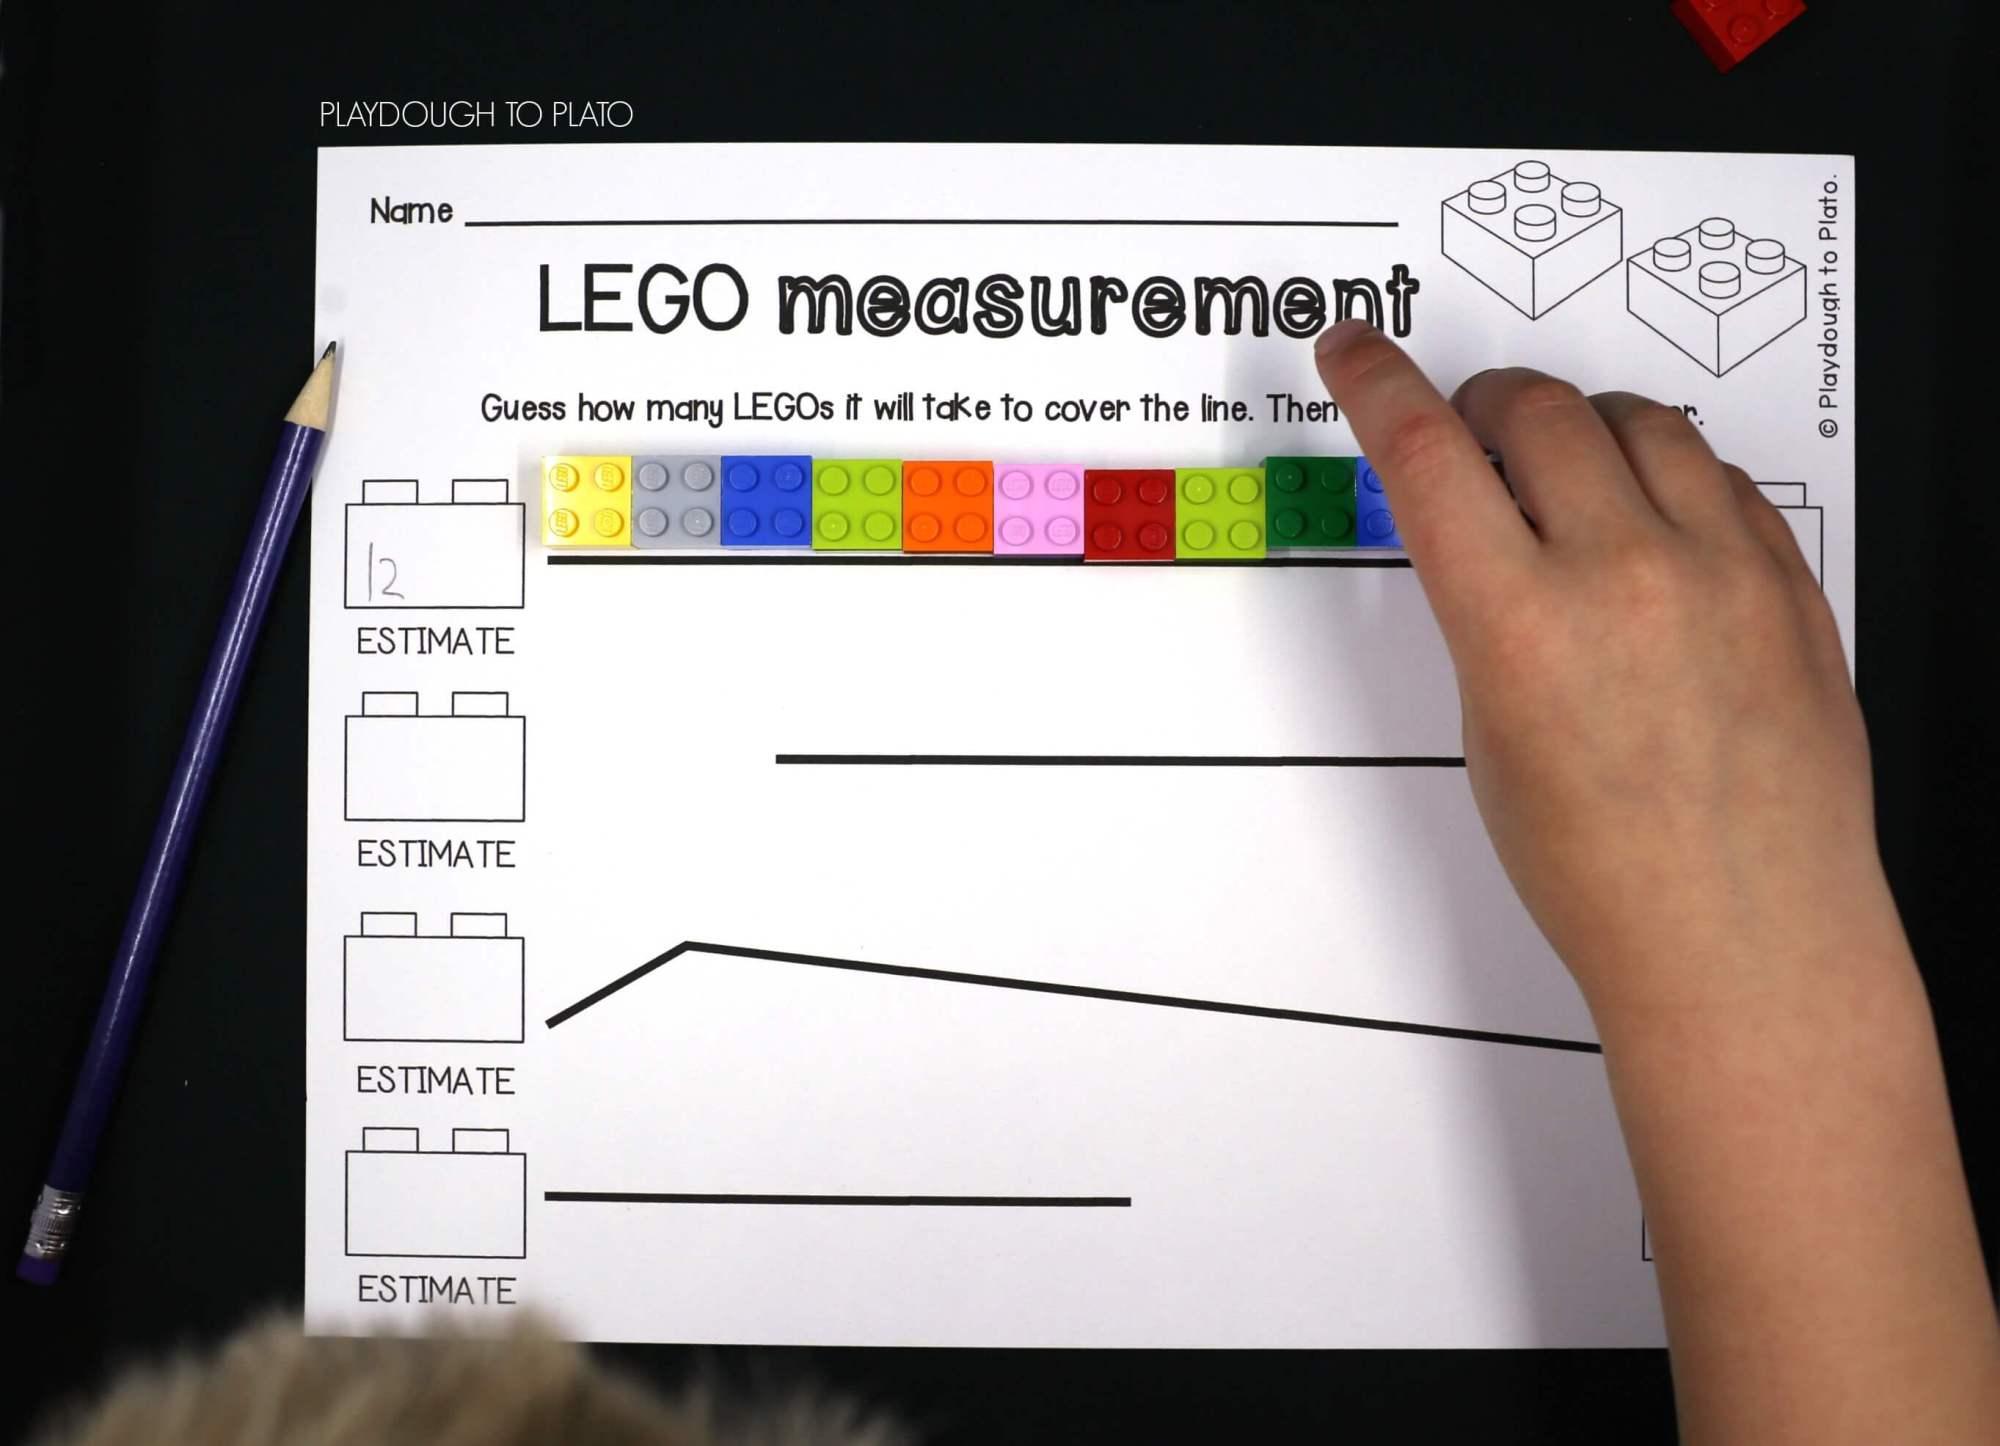 hight resolution of LEGO Measurement - Playdough To Plato